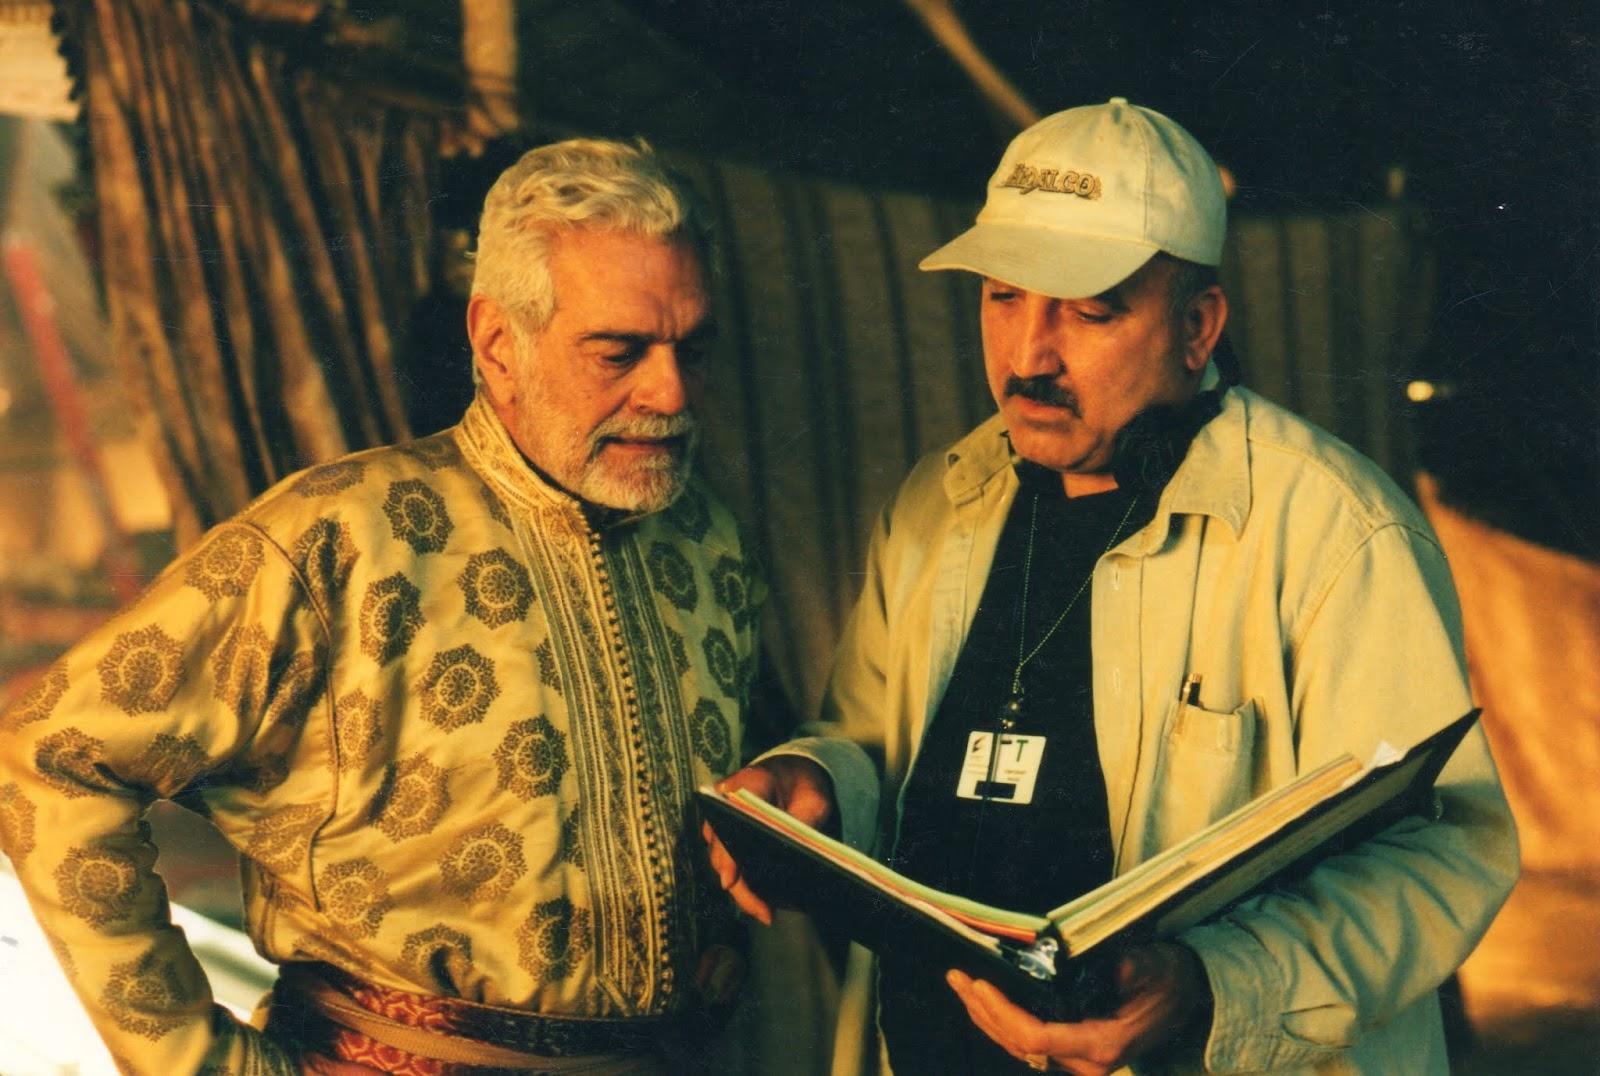 With Omar Sharif